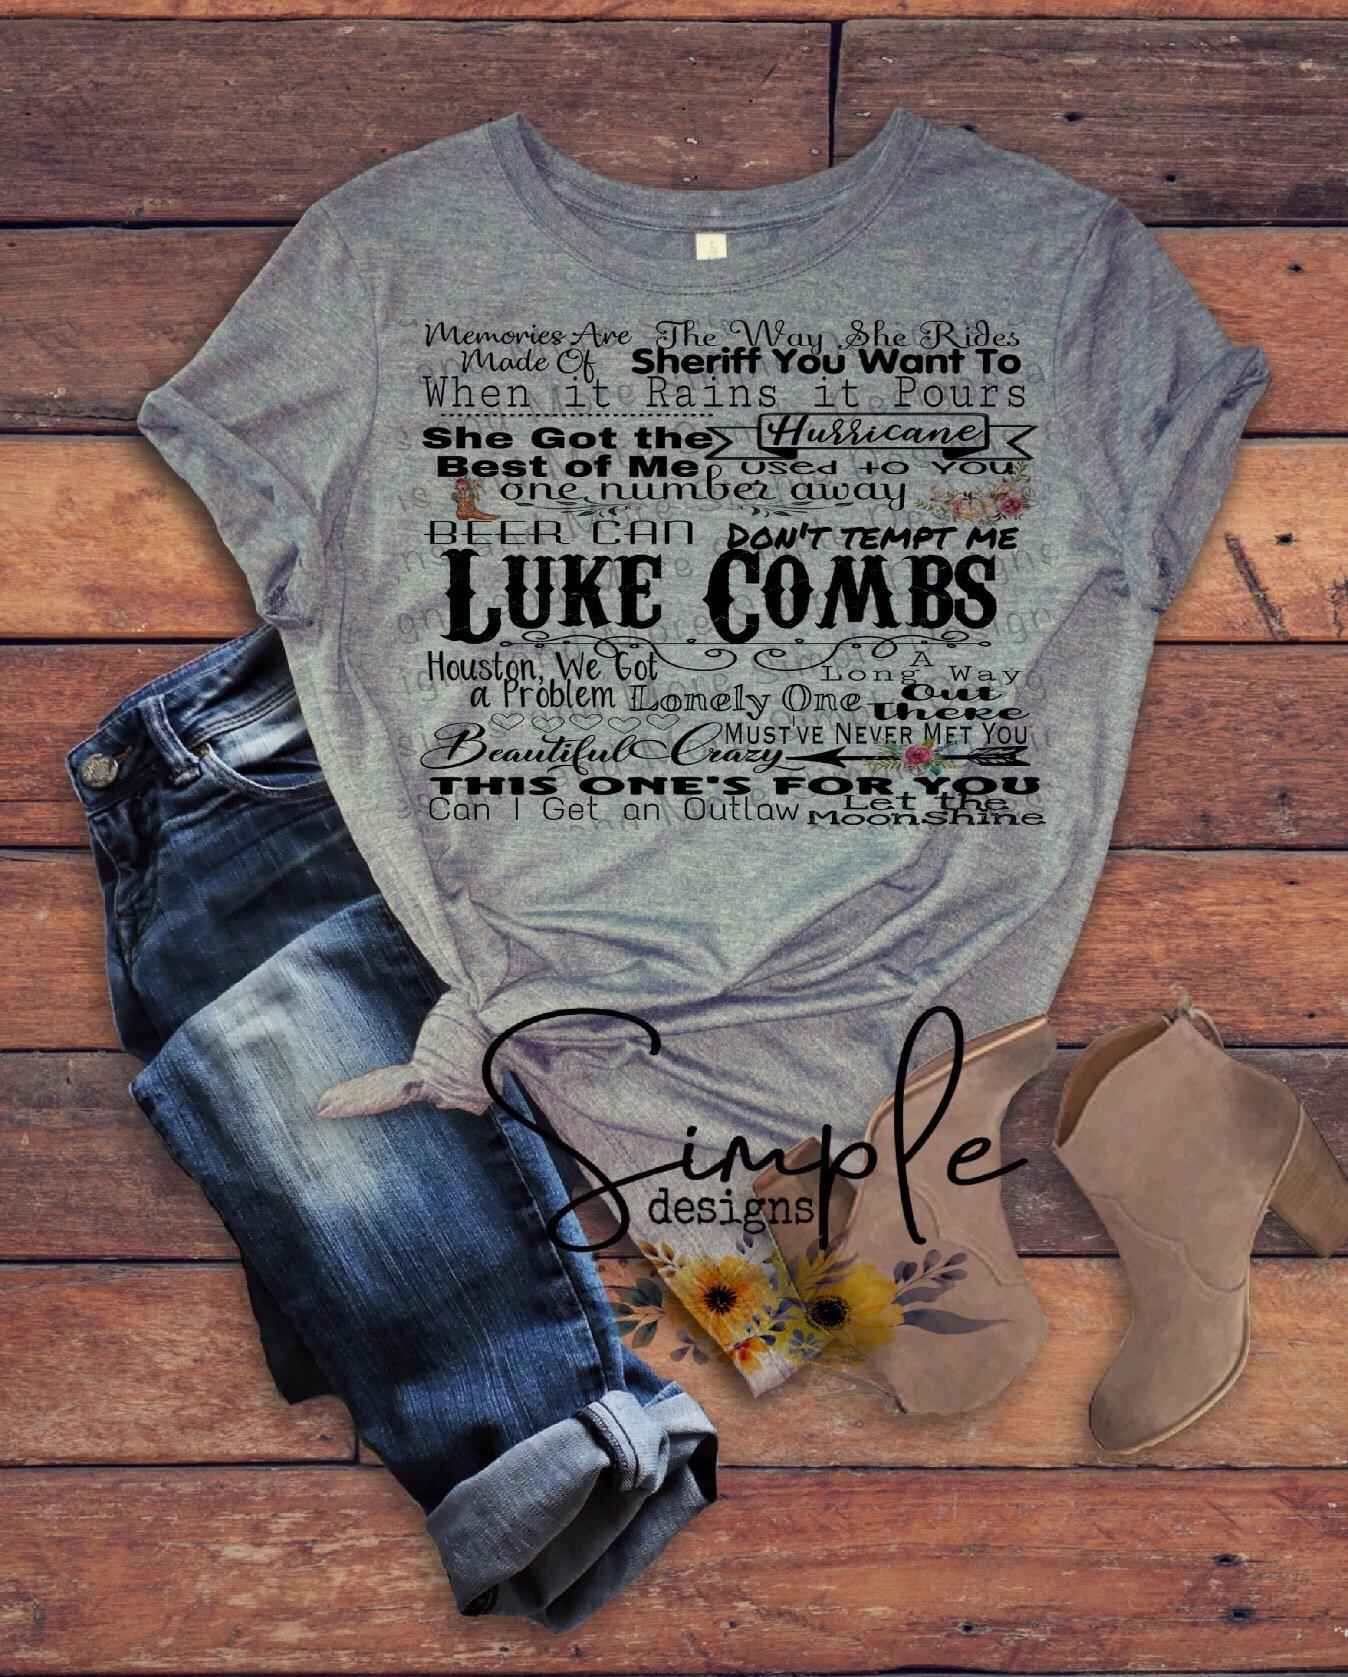 d3e6b4470bdf Luke Combs Lyrics T-shirt, Raglan, Country Music Lyrics in 2019 ...